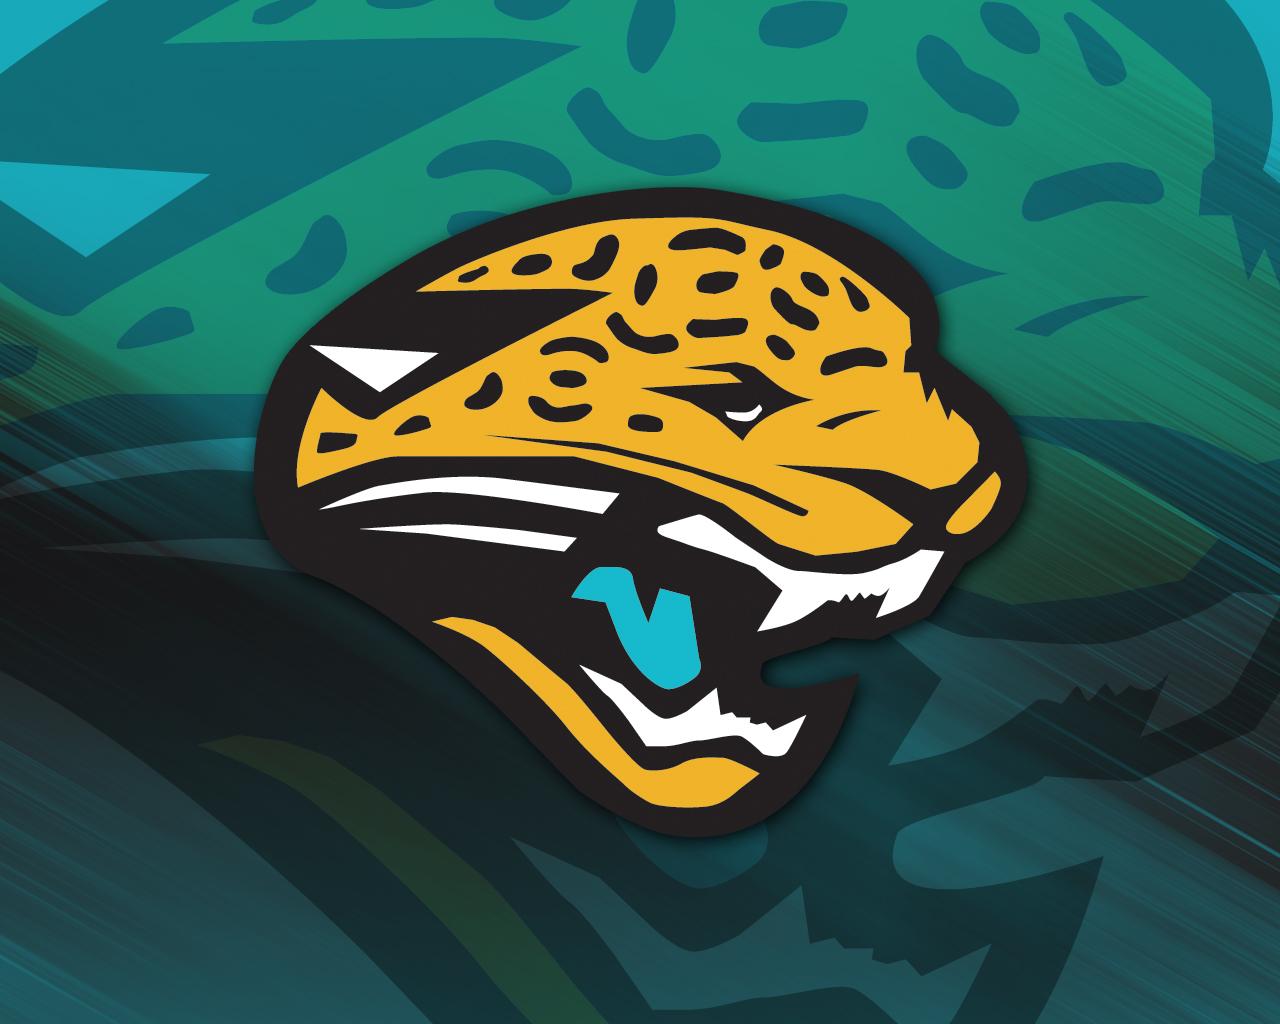 http://3.bp.blogspot.com/-kK454cfnZbM/Tdf2W42bOvI/AAAAAAAAUfk/2mBHHyVVoiQ/s1600/Jacksonville_Jaguars_Logo14.jpg